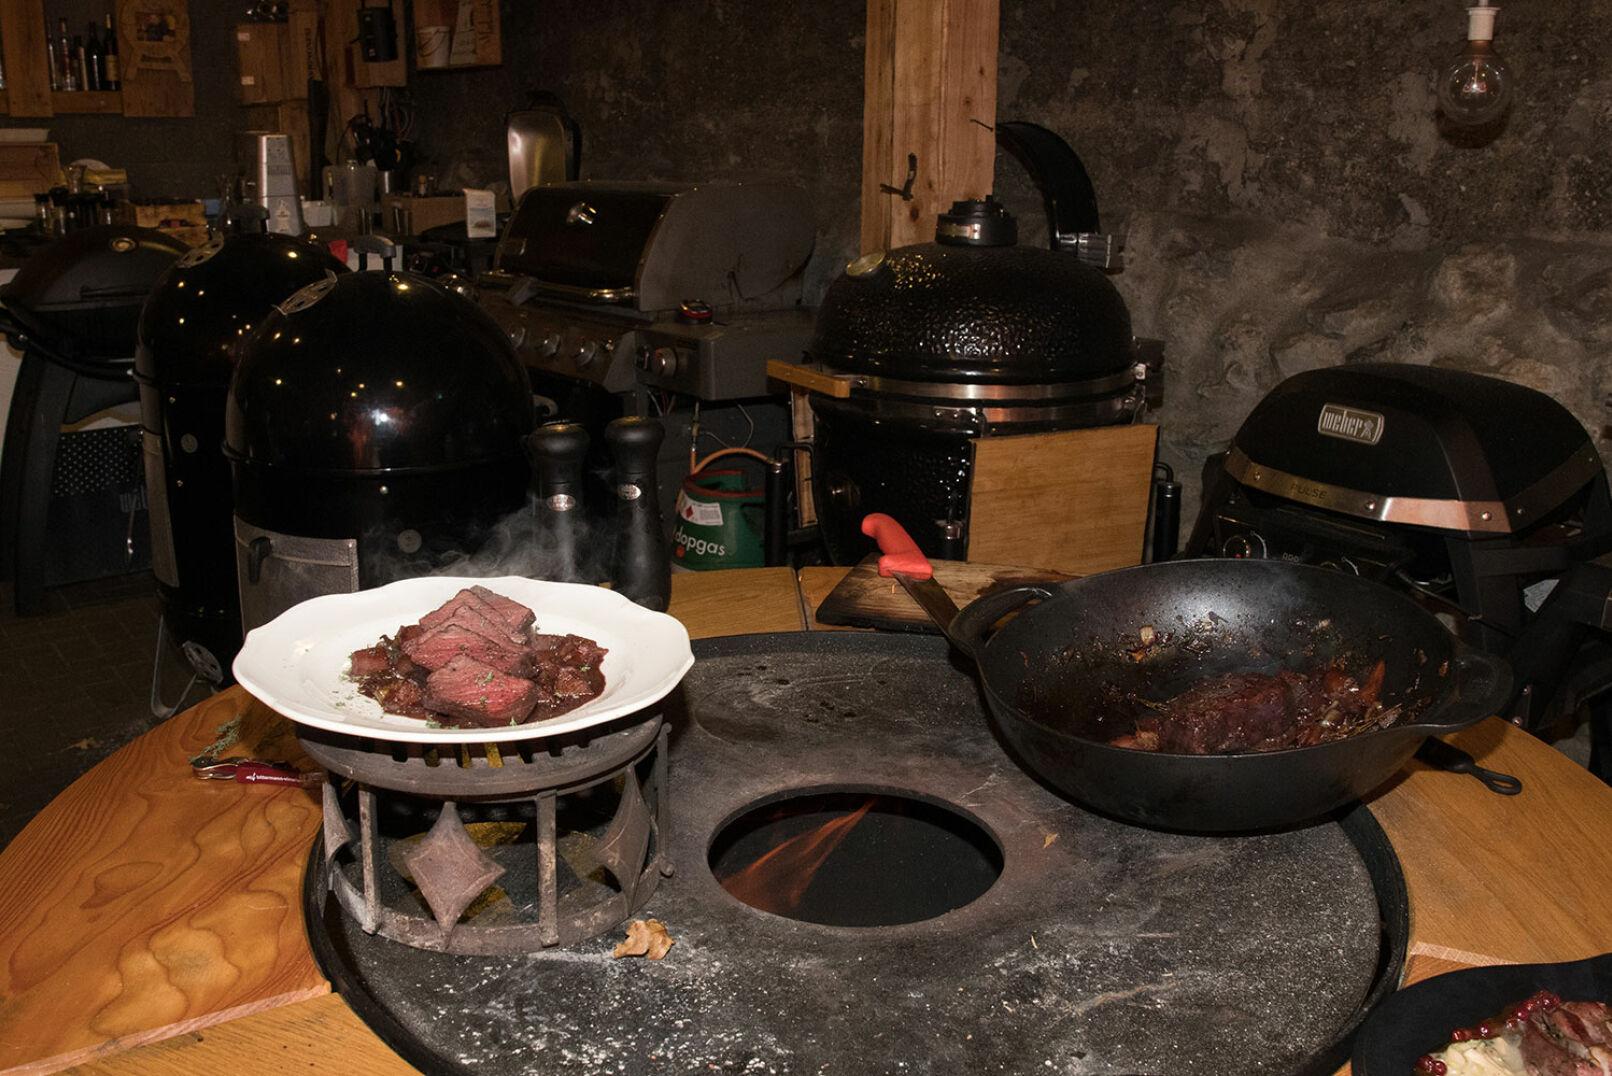 ... auf dem Birnen-Zwiebel-Ragout anrichten. Wir wünschen guten Appetit!  - © Martin Grasberger